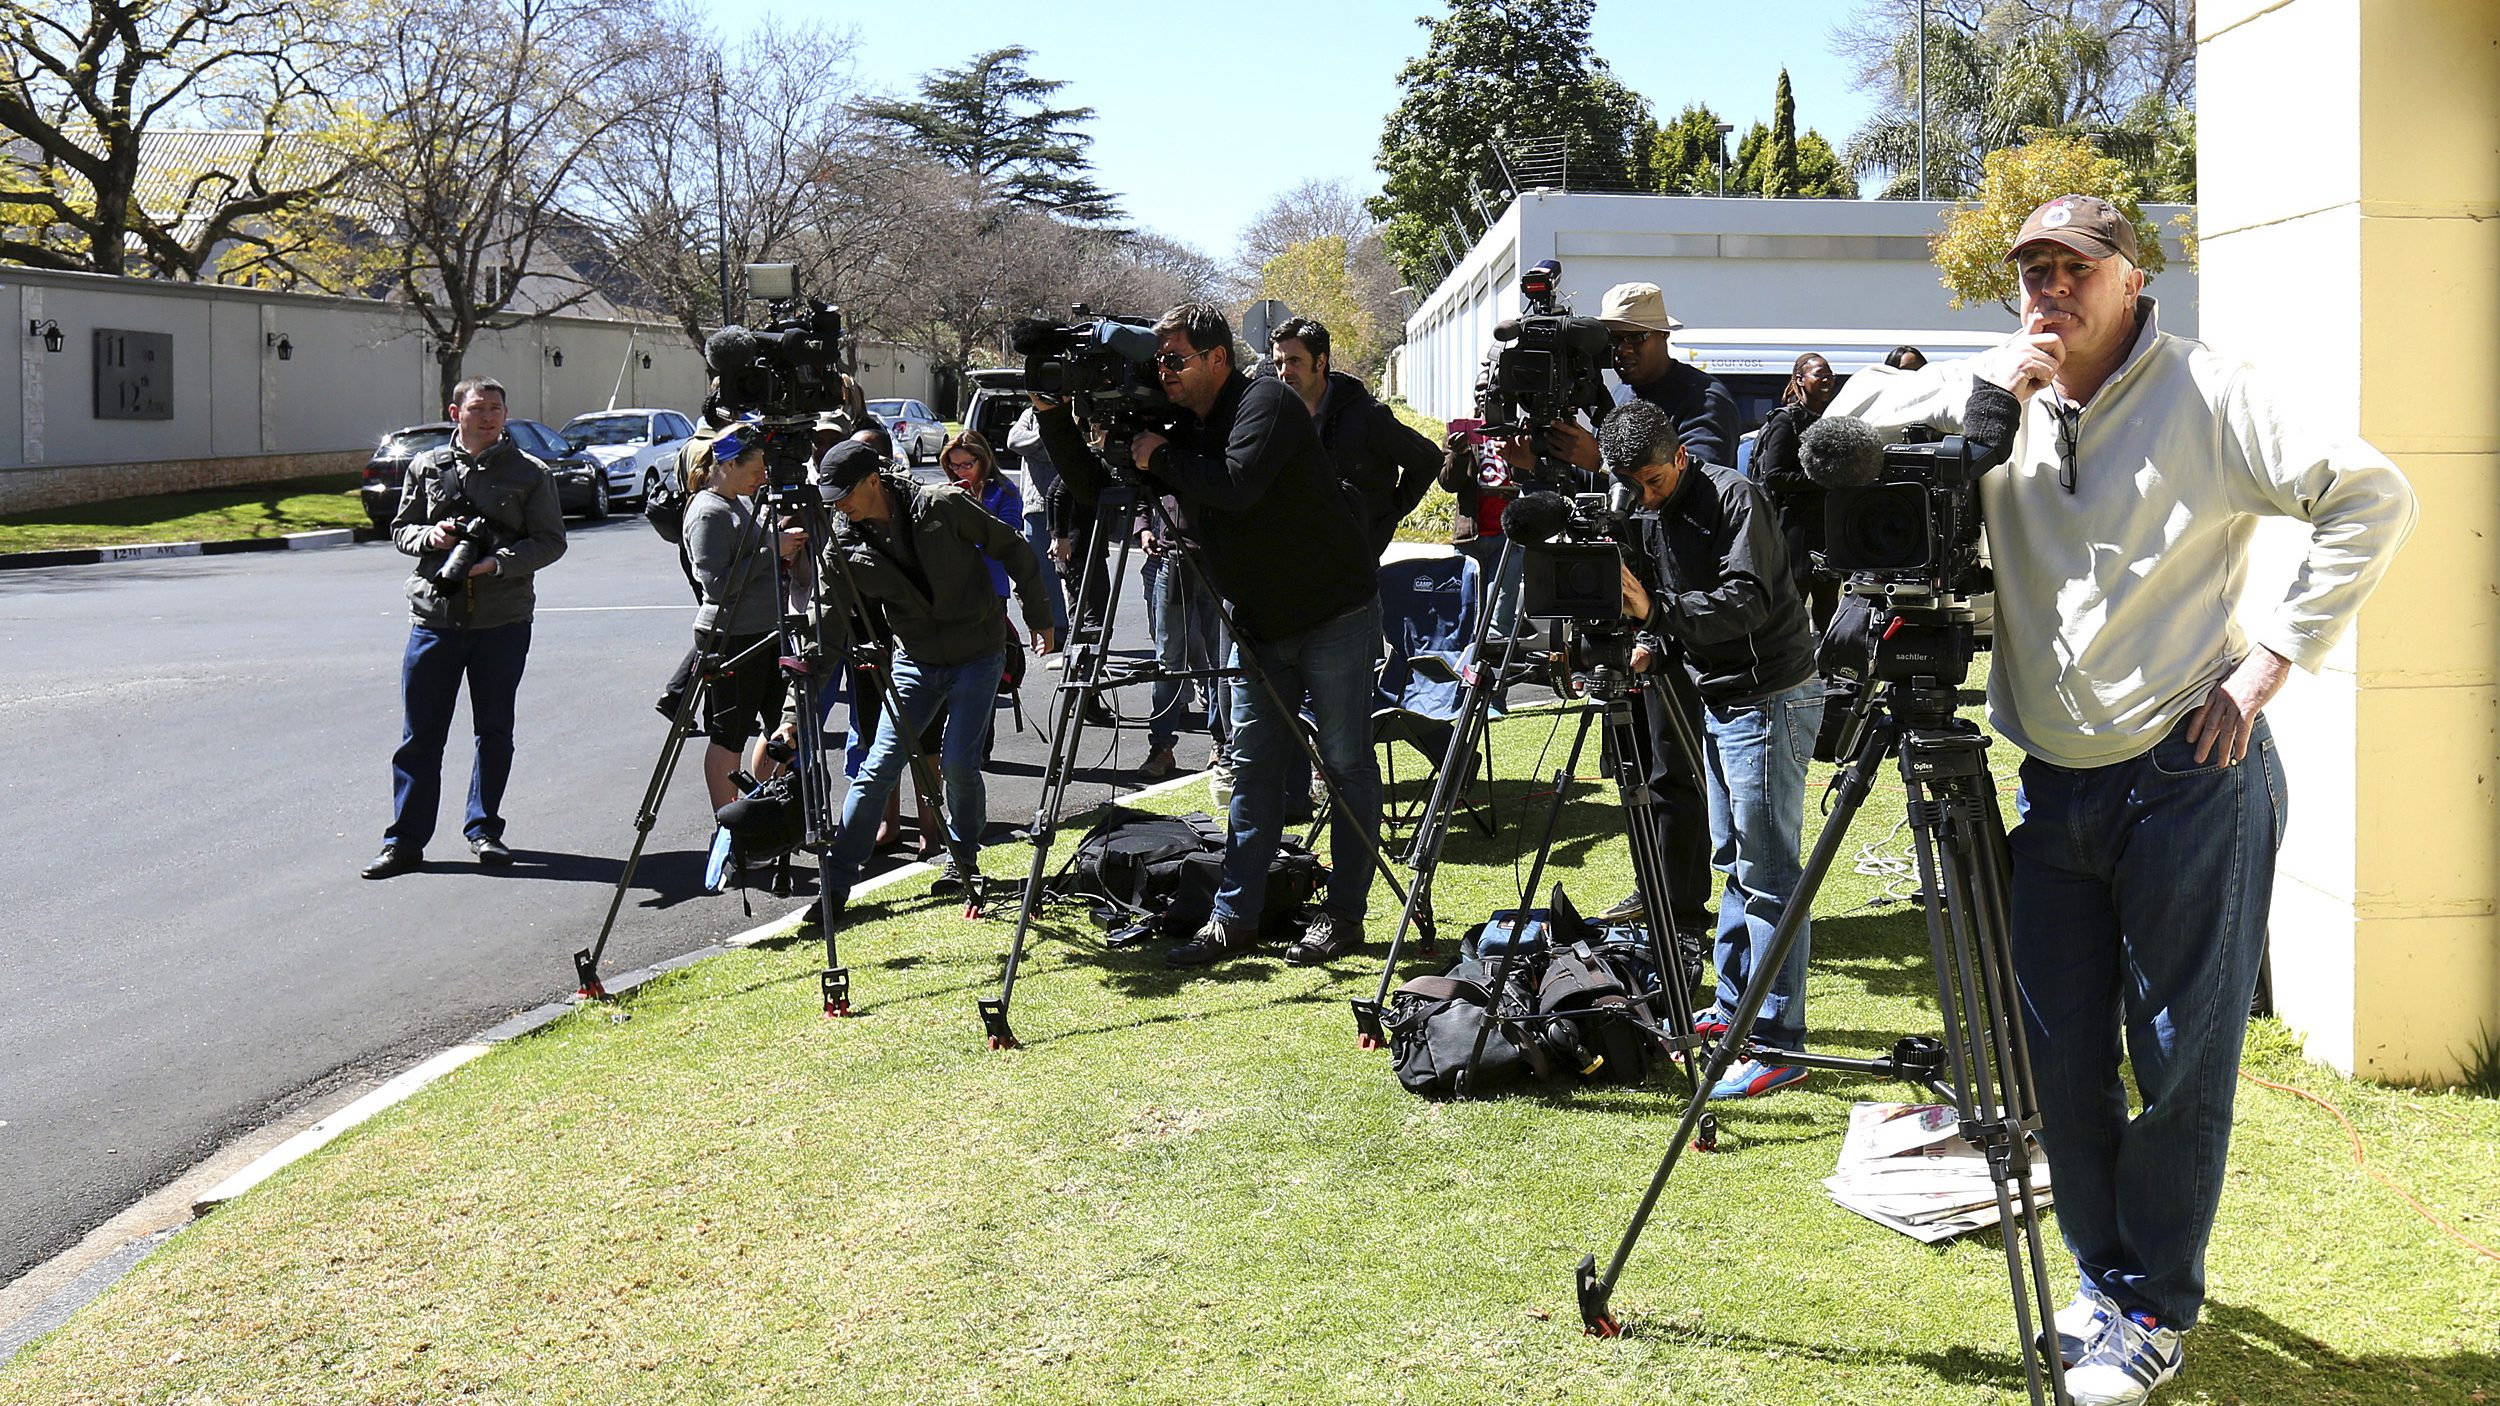 Members of the media stand outside former South African President Mandela's house in Houghton, Johannesburg